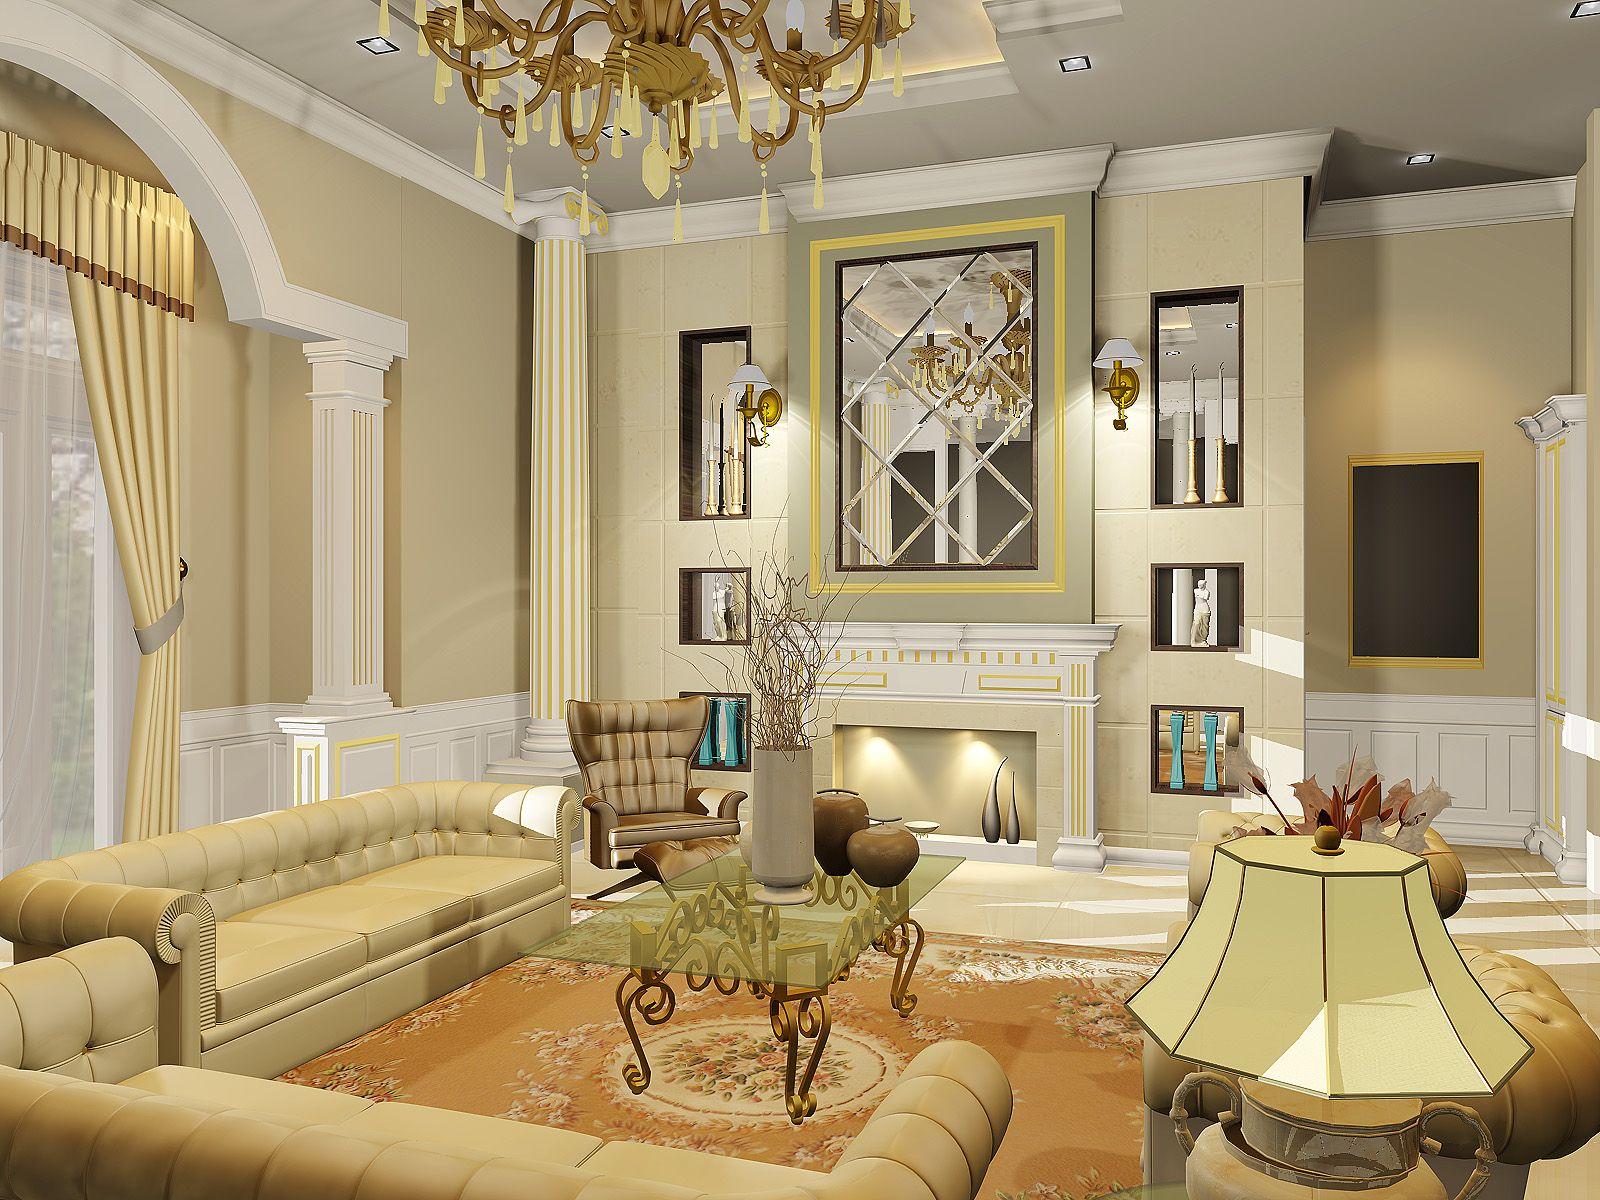 Classic Interior Design Wallpapers Description Luxury Classic